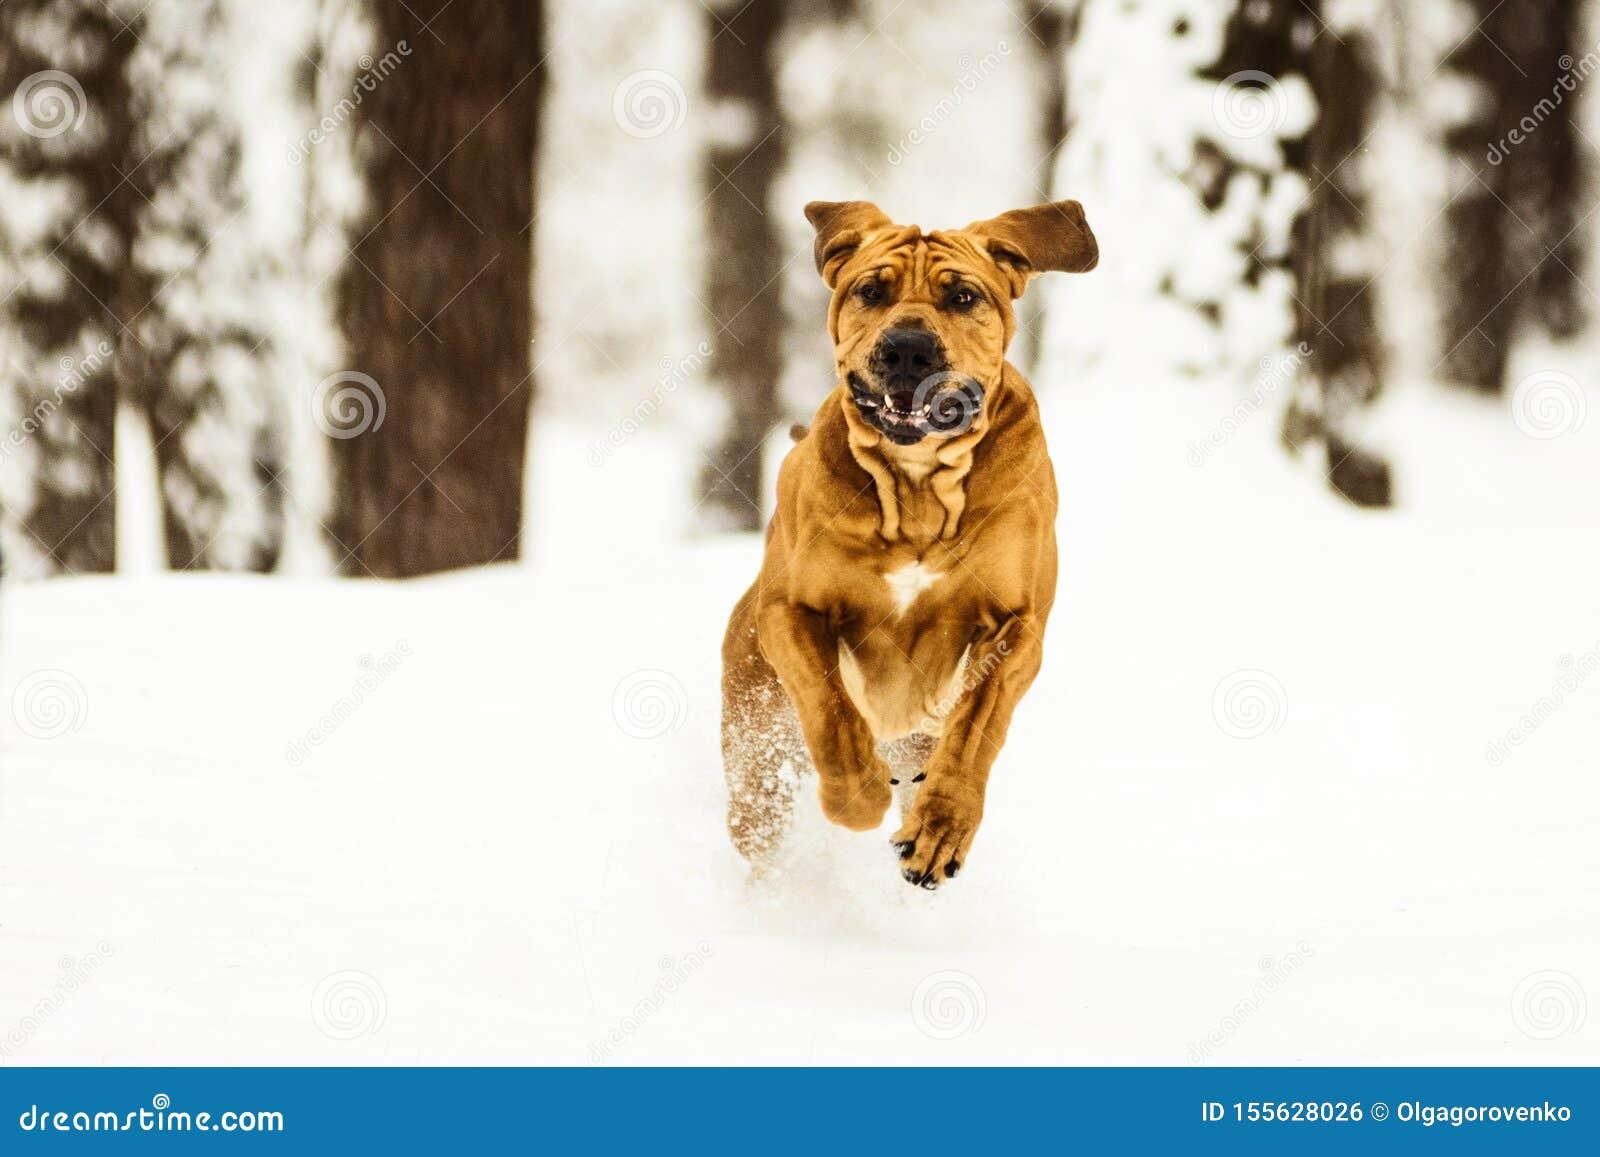 Adult Fila Brasileiro having fun in snow